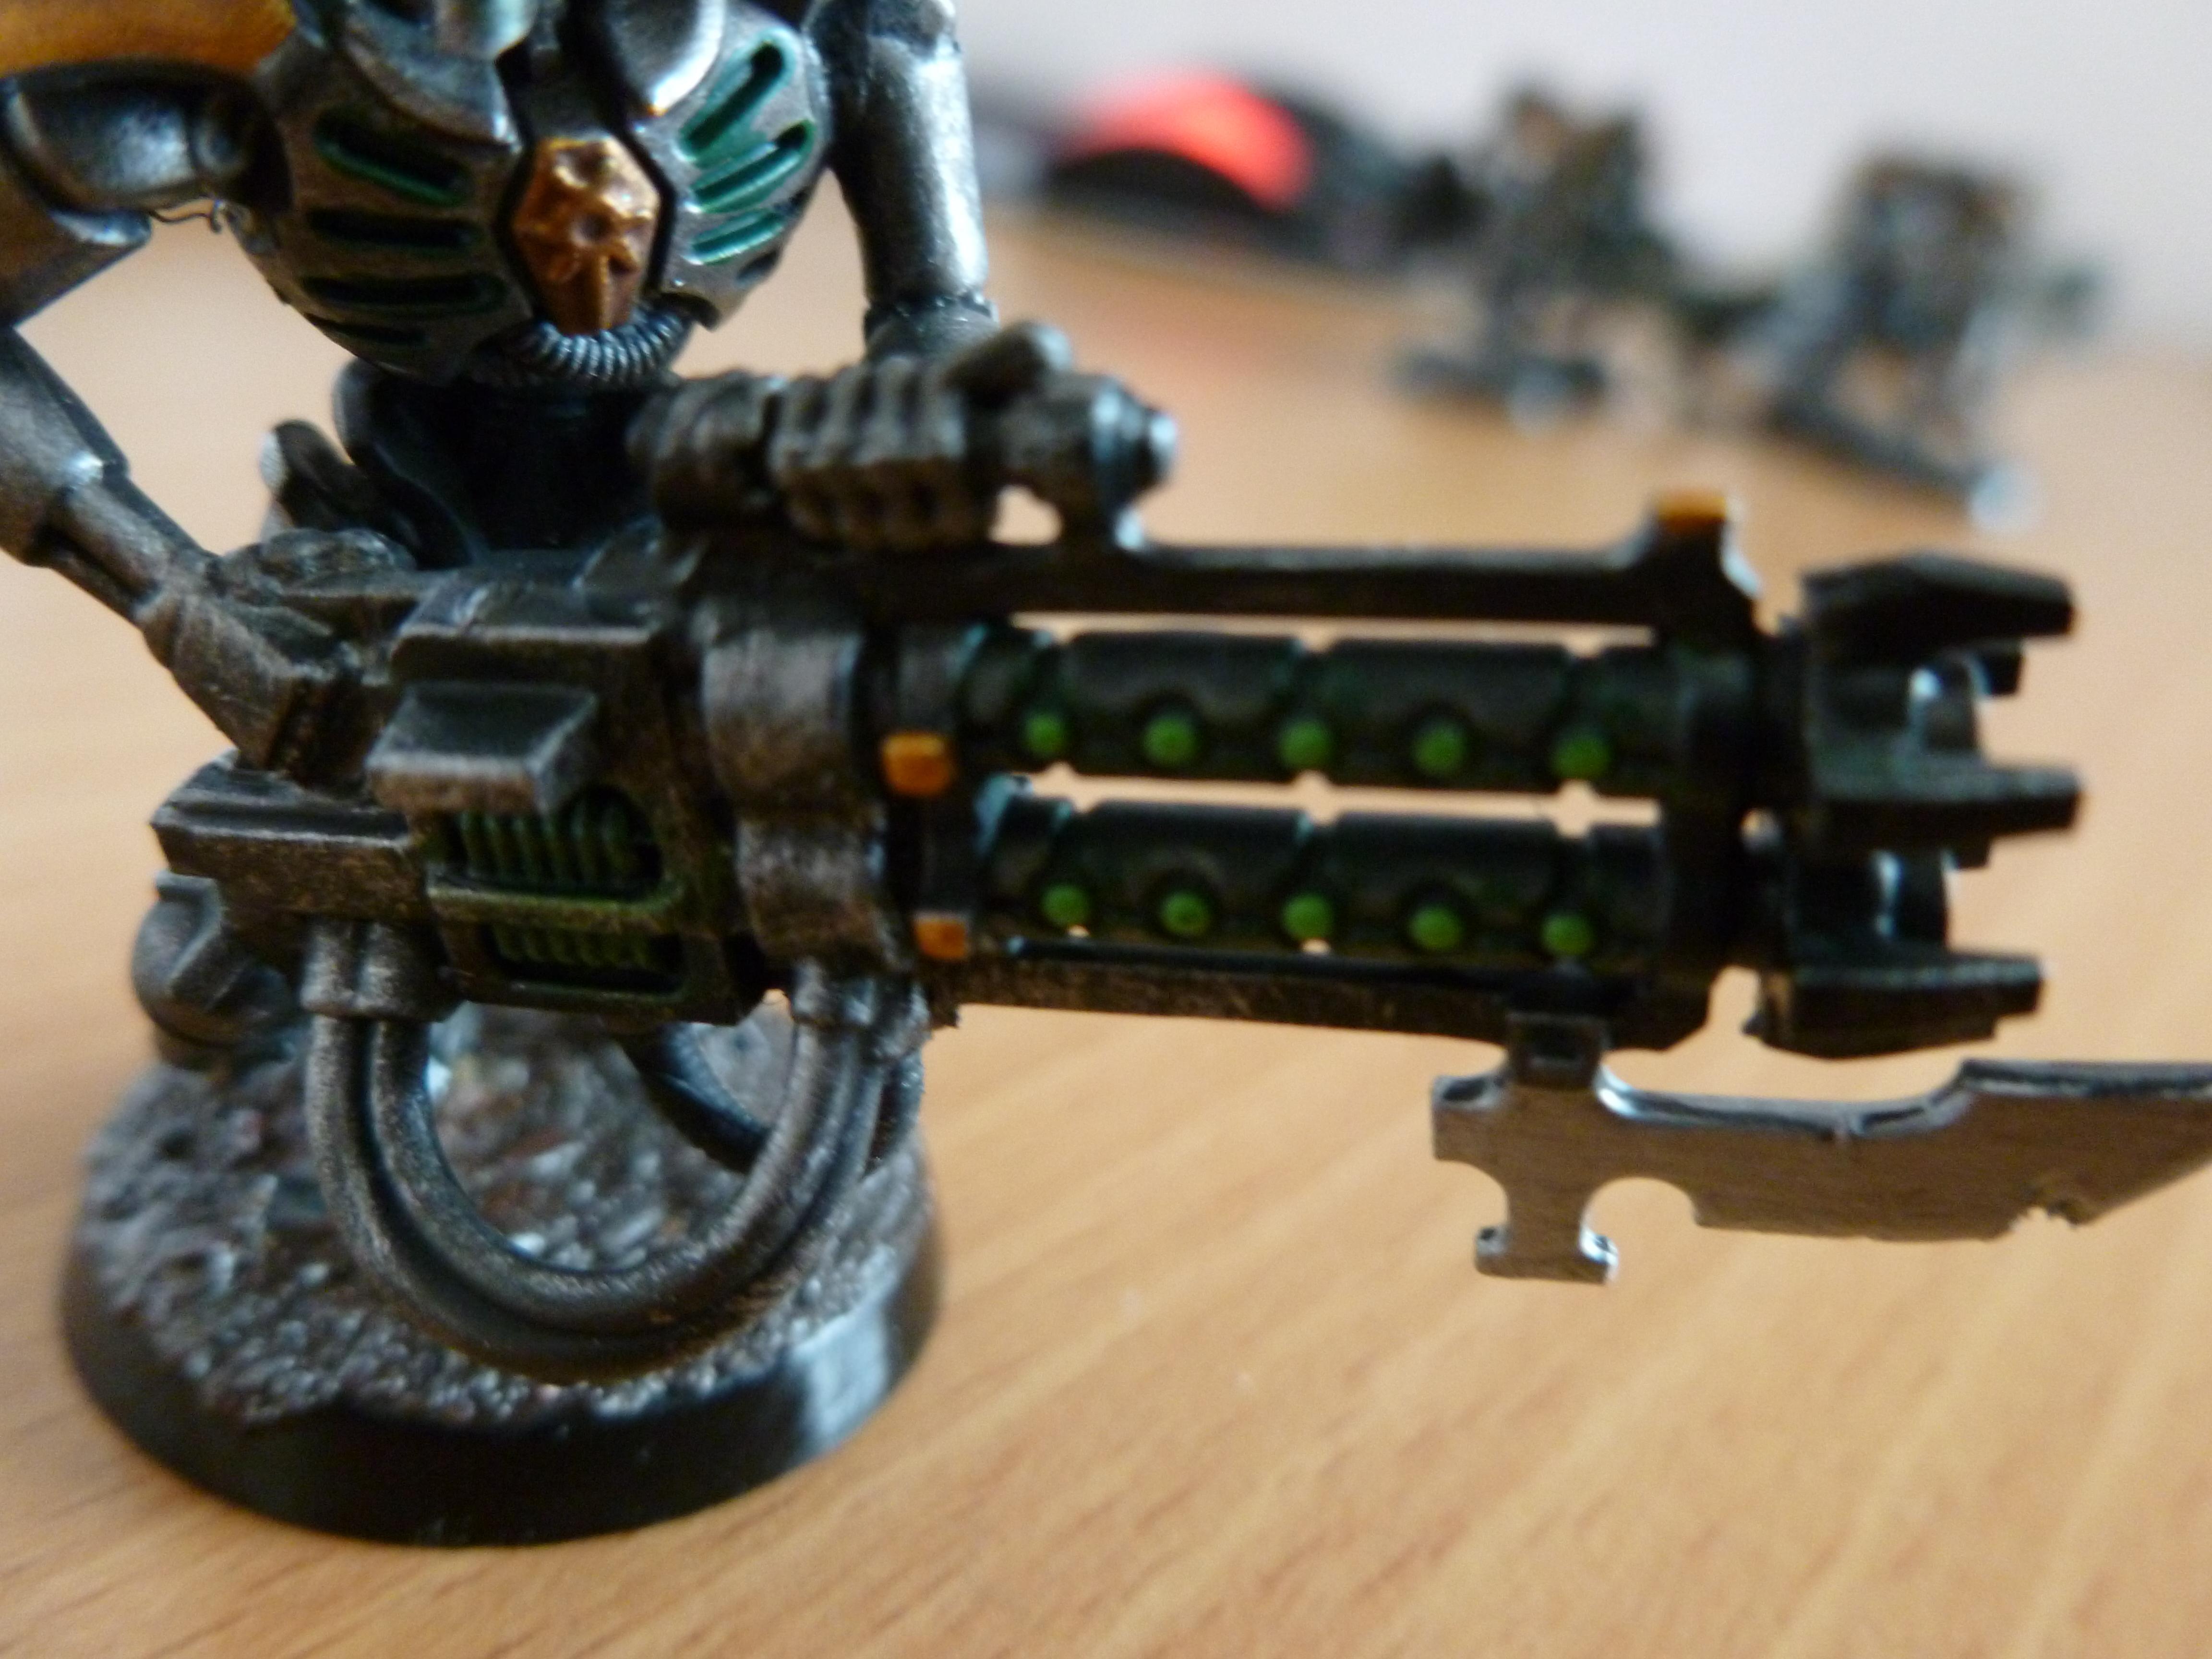 Gauss Blaster, Green, Gun, Shooting